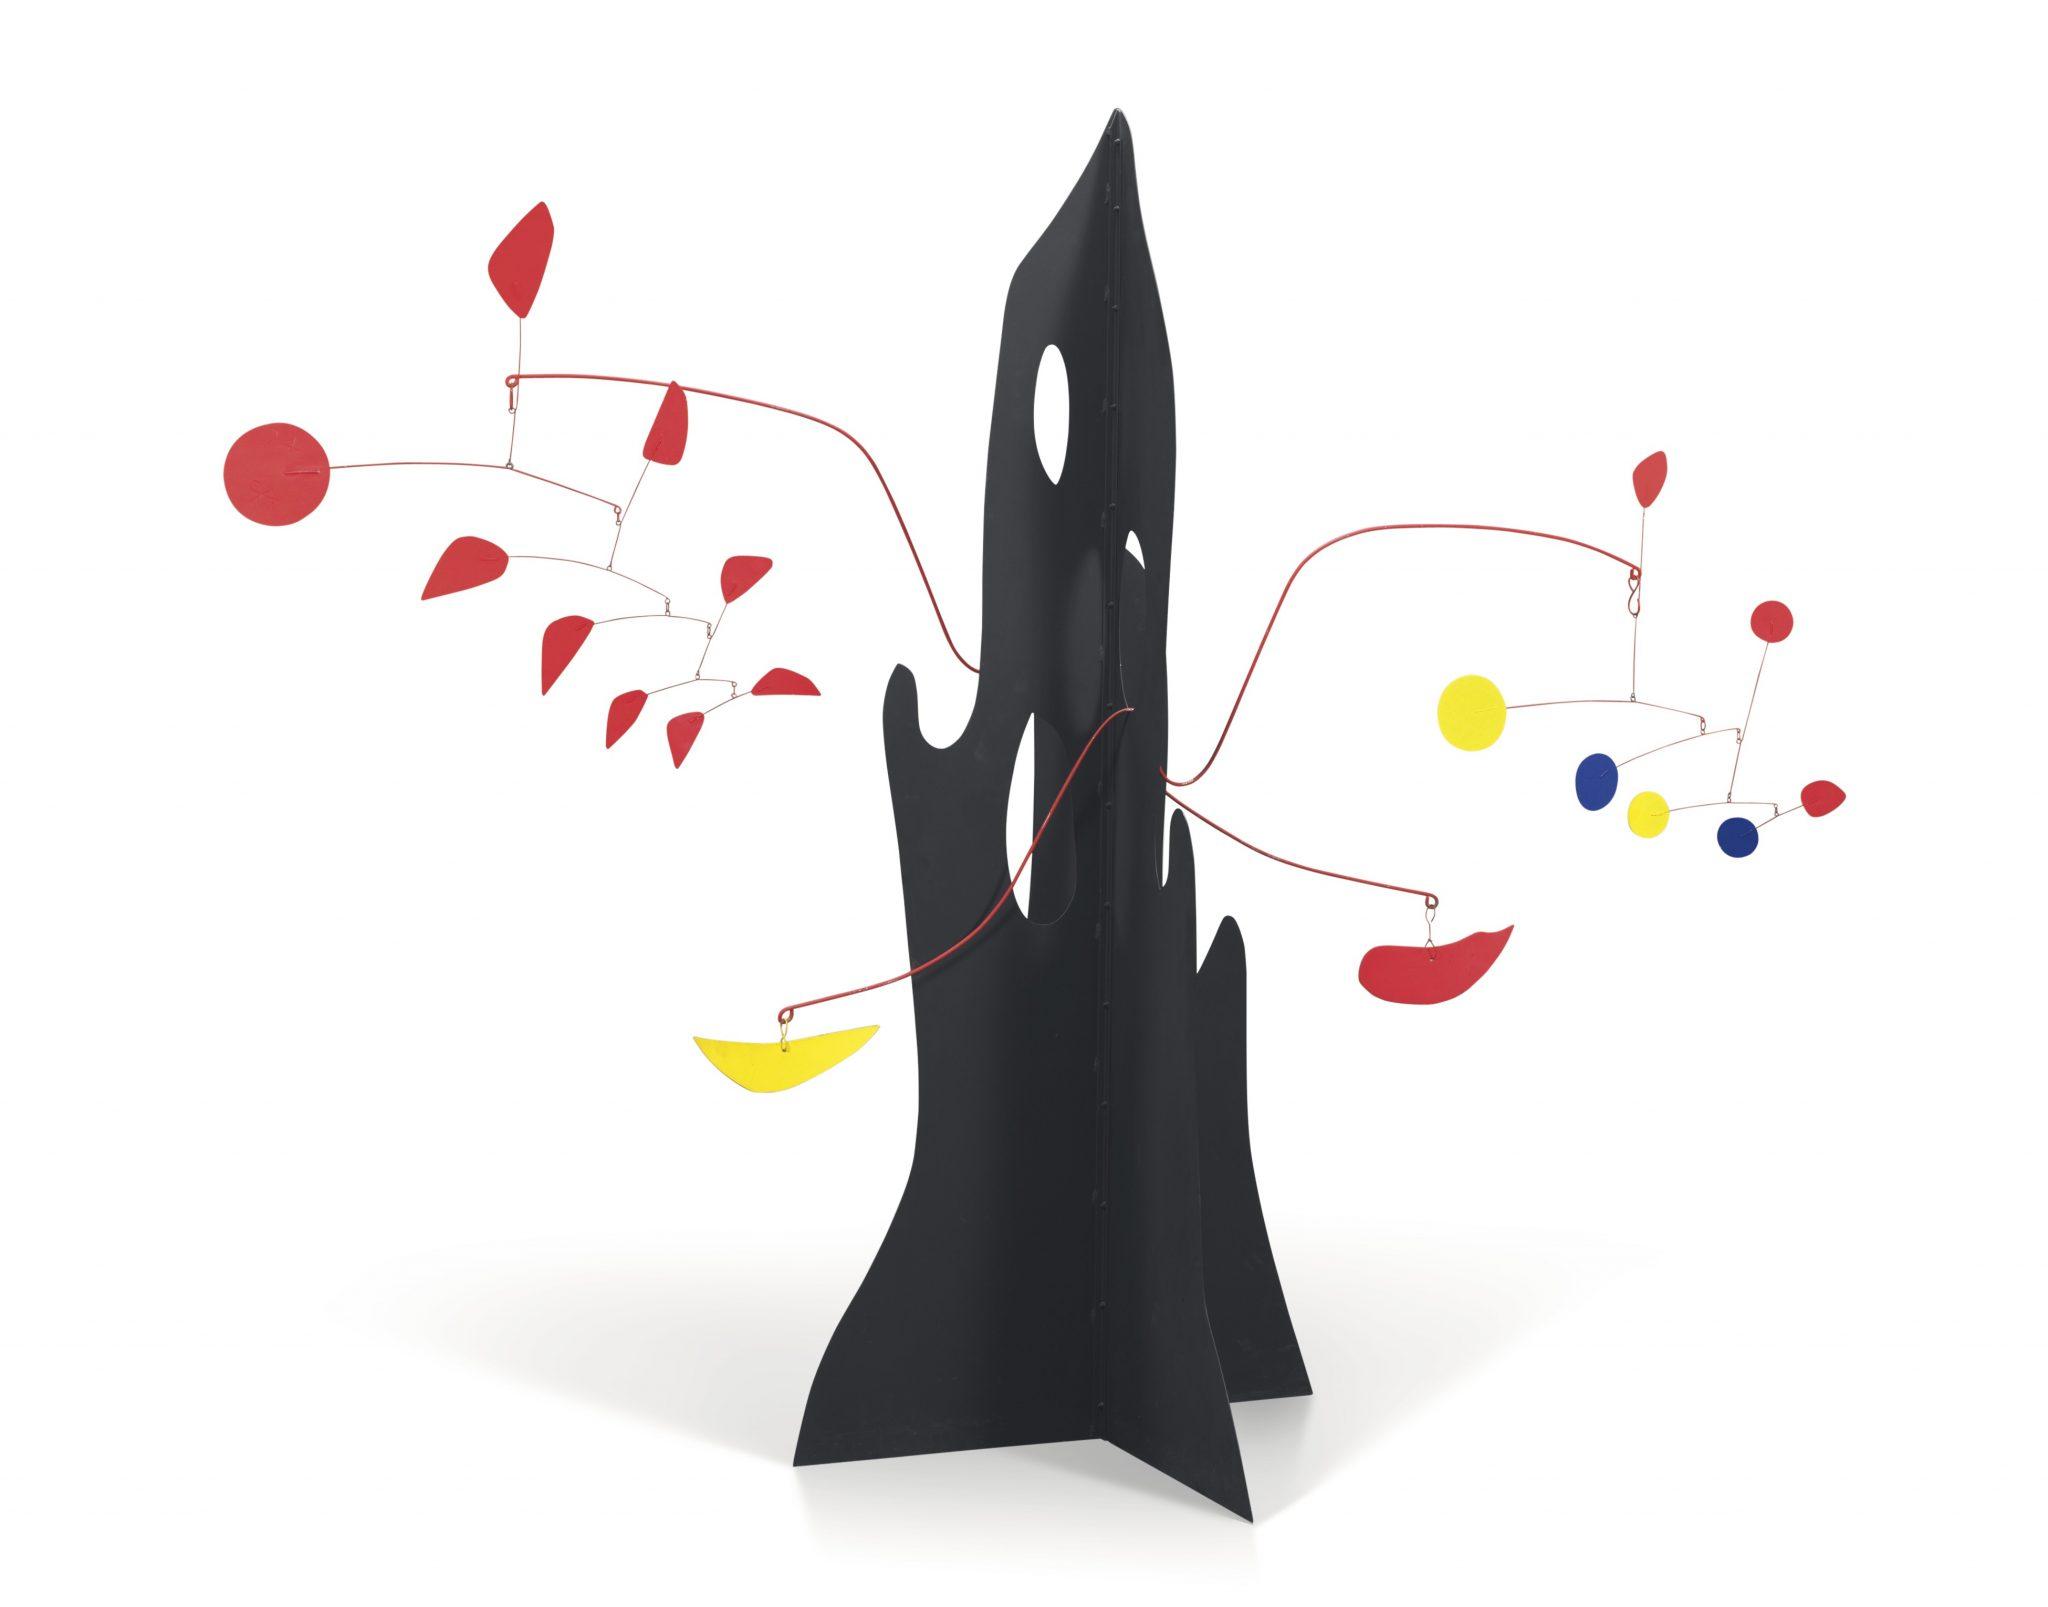 Alexander Calder, Crag with Yellow Boomerang and Red Eggplant, 1974, Láminas de metal pintado y alambre, 198.1 x 238.7 x 104.1cm, Pictures courtesy of Mayoral